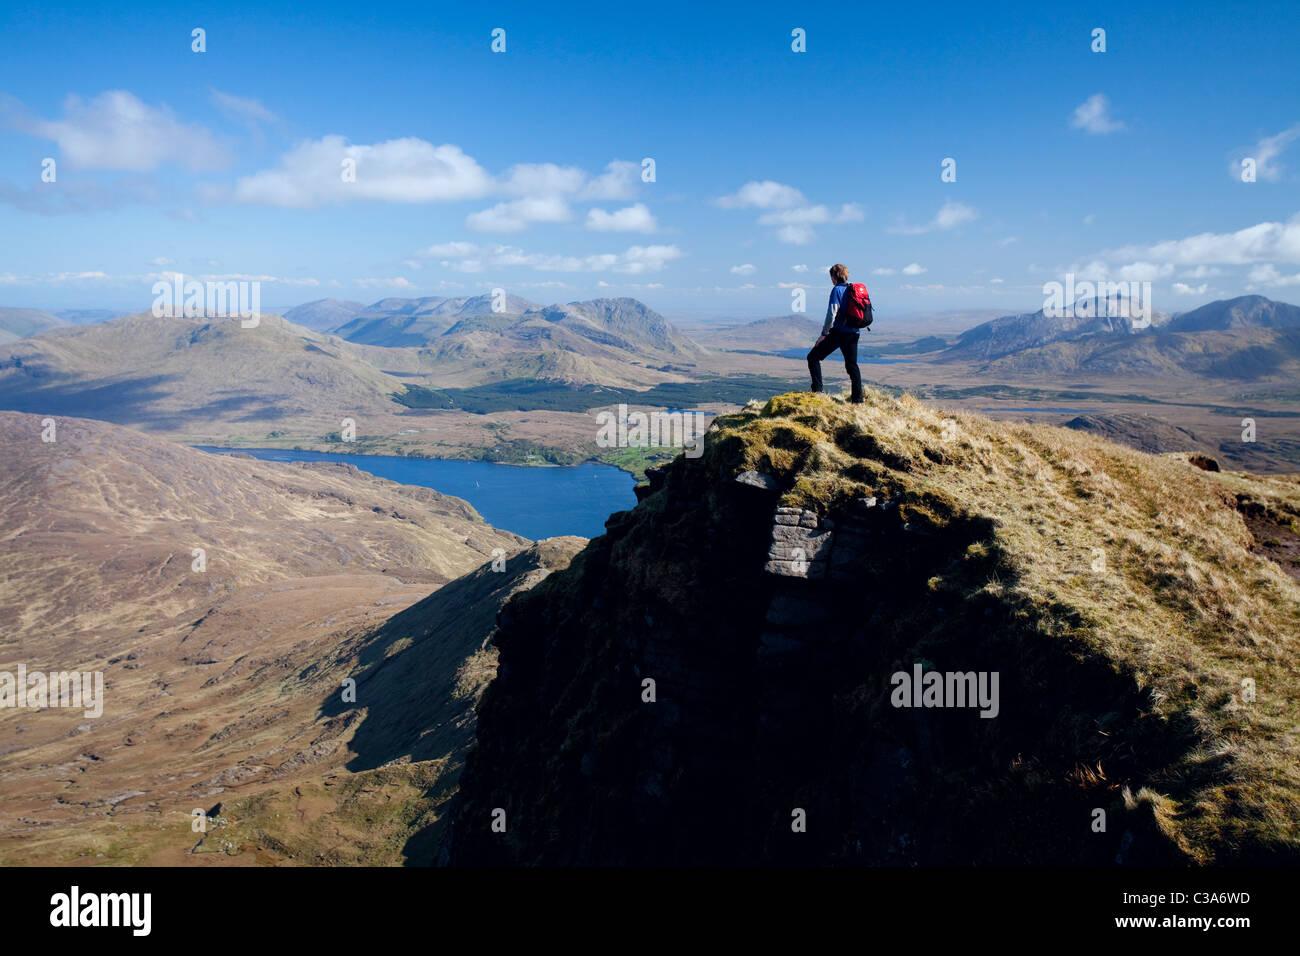 Walker looking across Killary Harbour from the southern ridge of Mweelrea Mountain, County Mayo, Ireland. - Stock Image